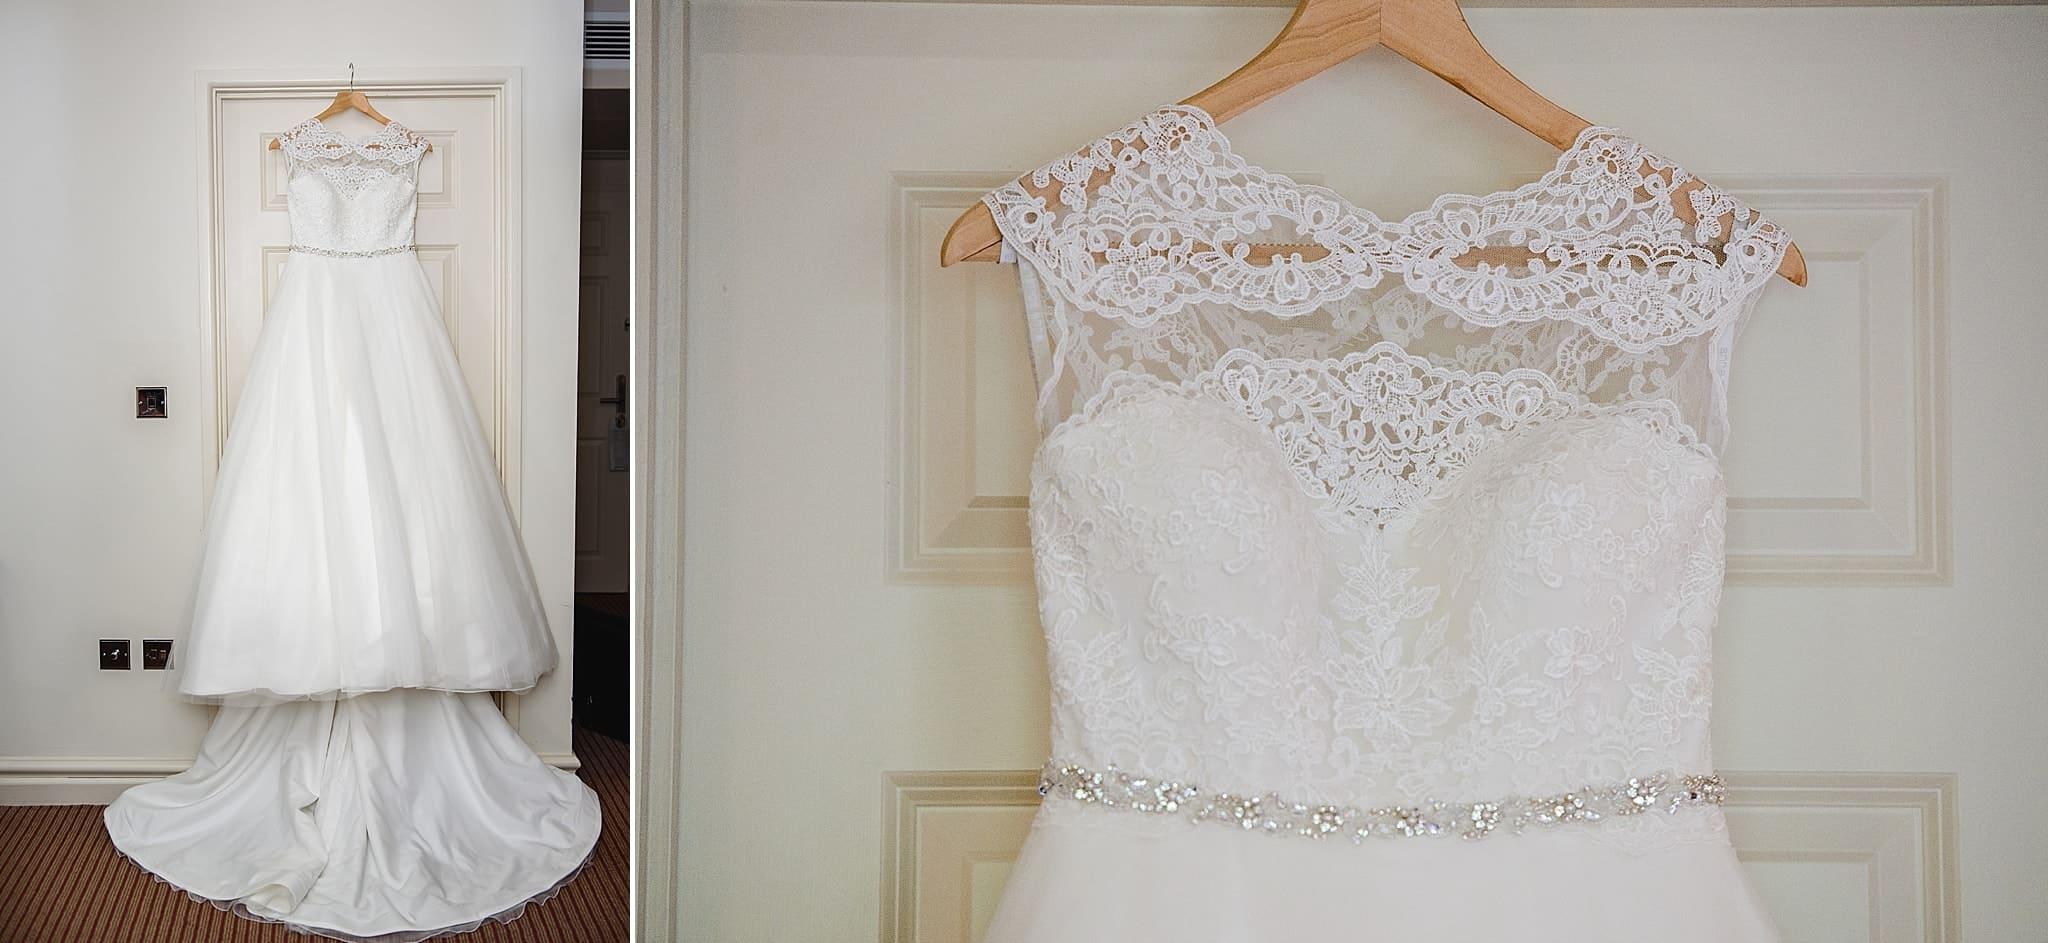 The wedding dress hung up